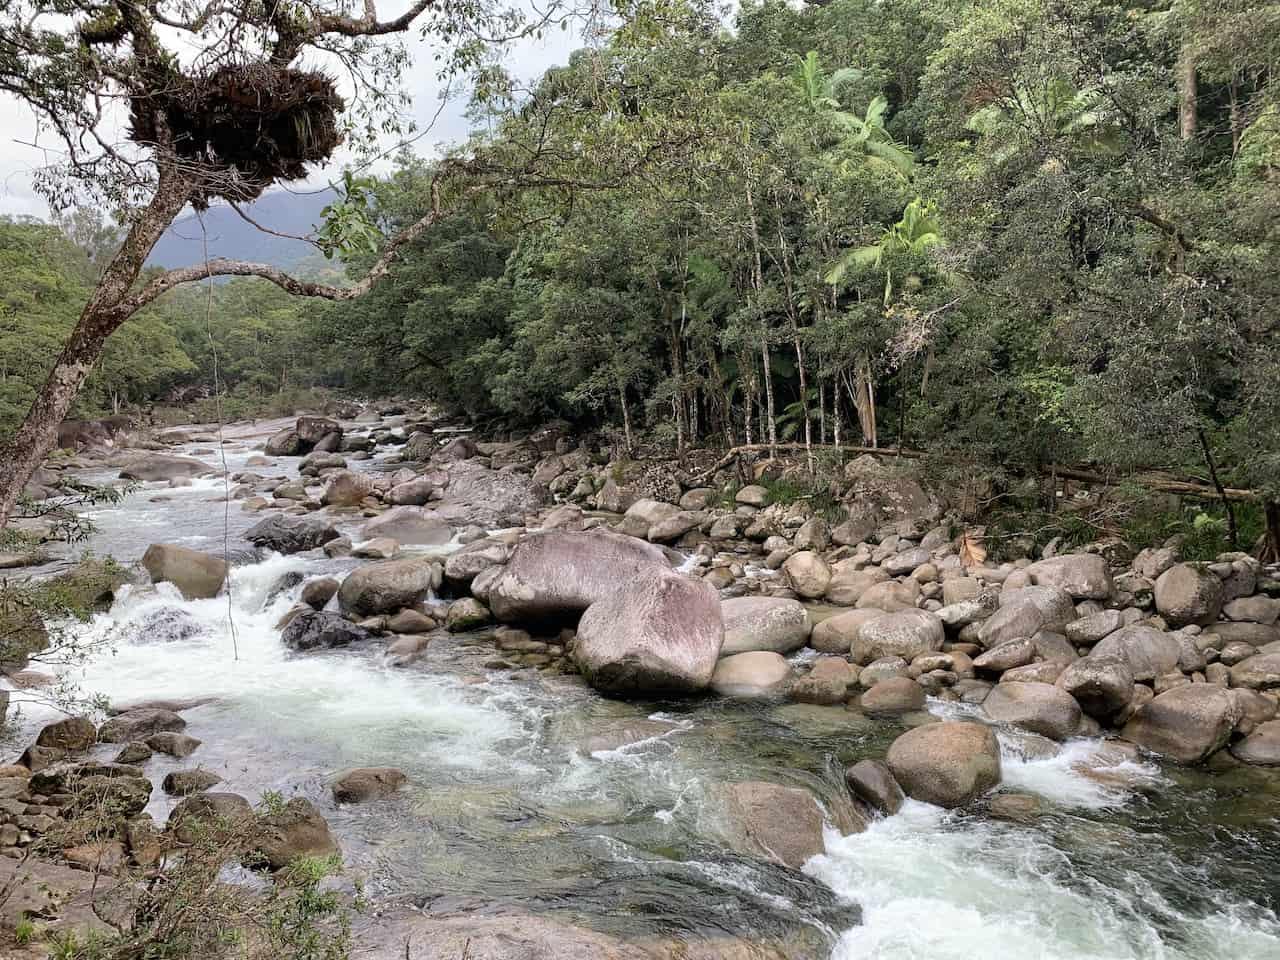 Mossman River Lookout Daintree